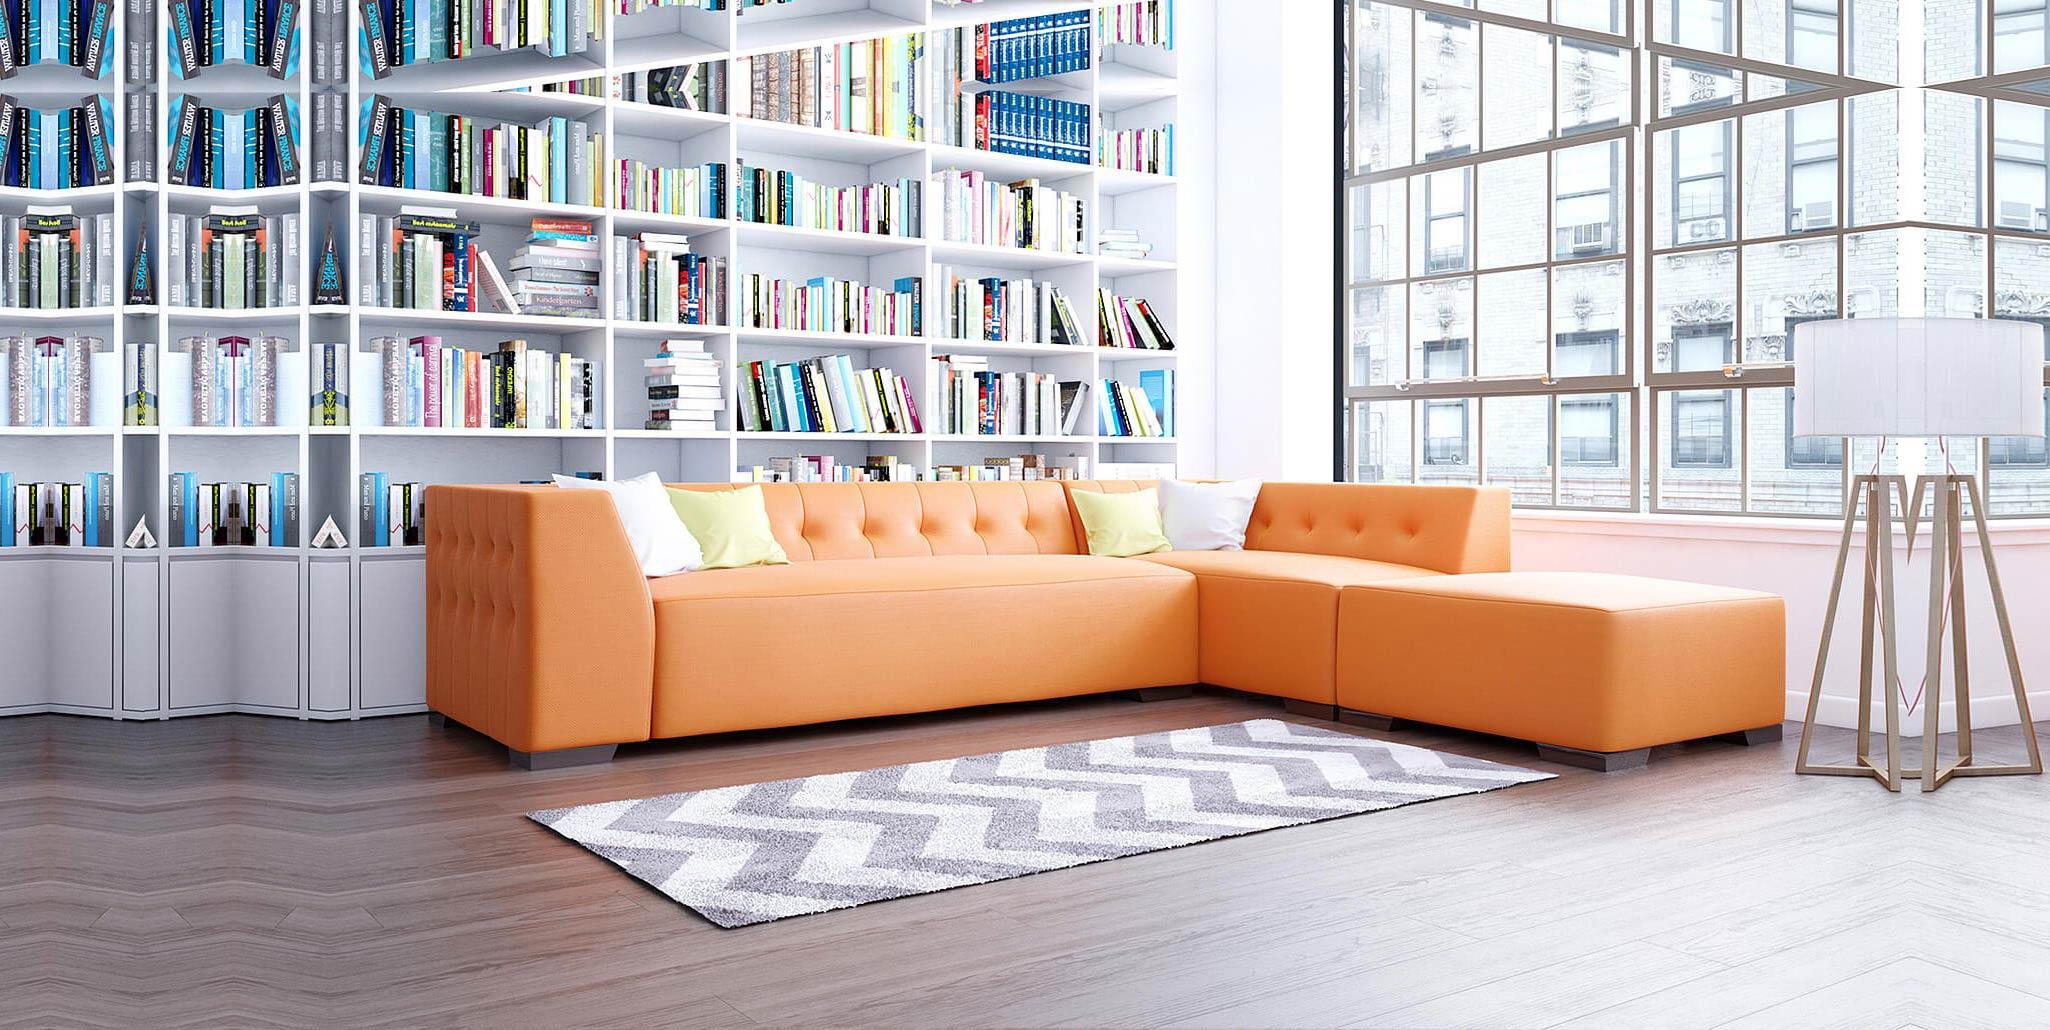 palermo panel furniture gallery 1